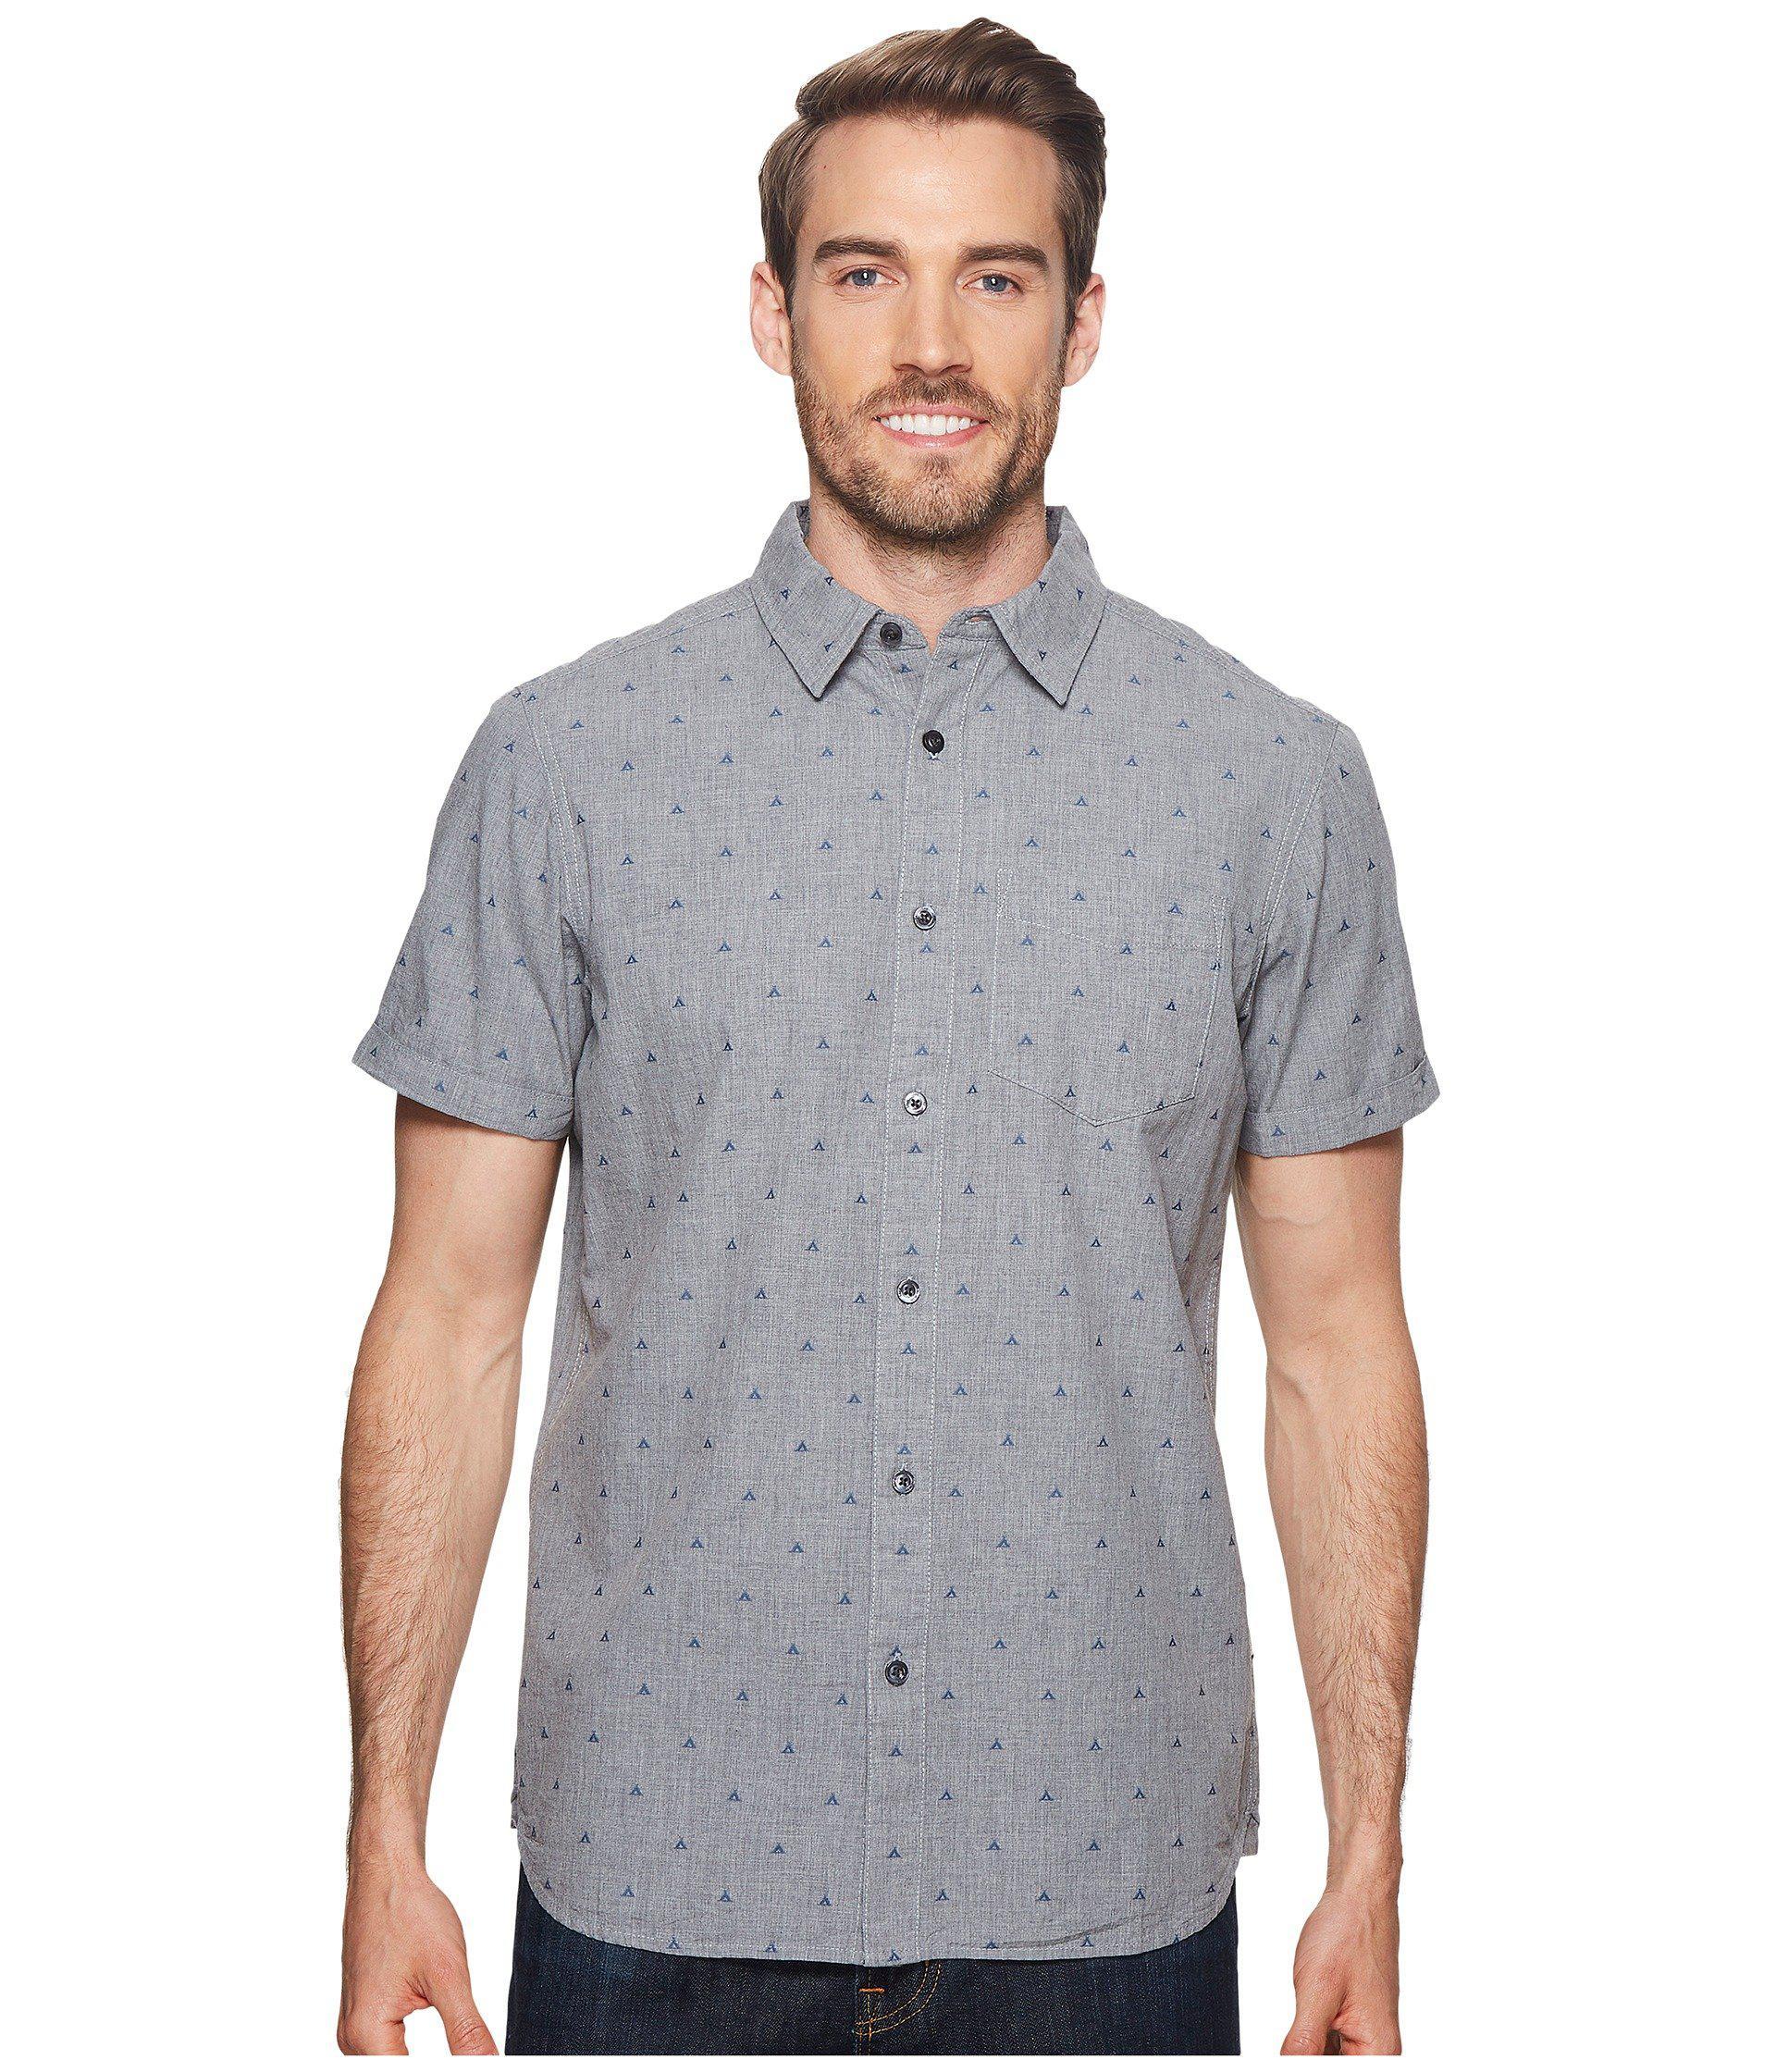 addab4e20 Men's Short Sleeve Bay Trail Jacquard Shirt (tnf Medium Gray Heather/tent  Clip Dot) Short Sleeve Button Up